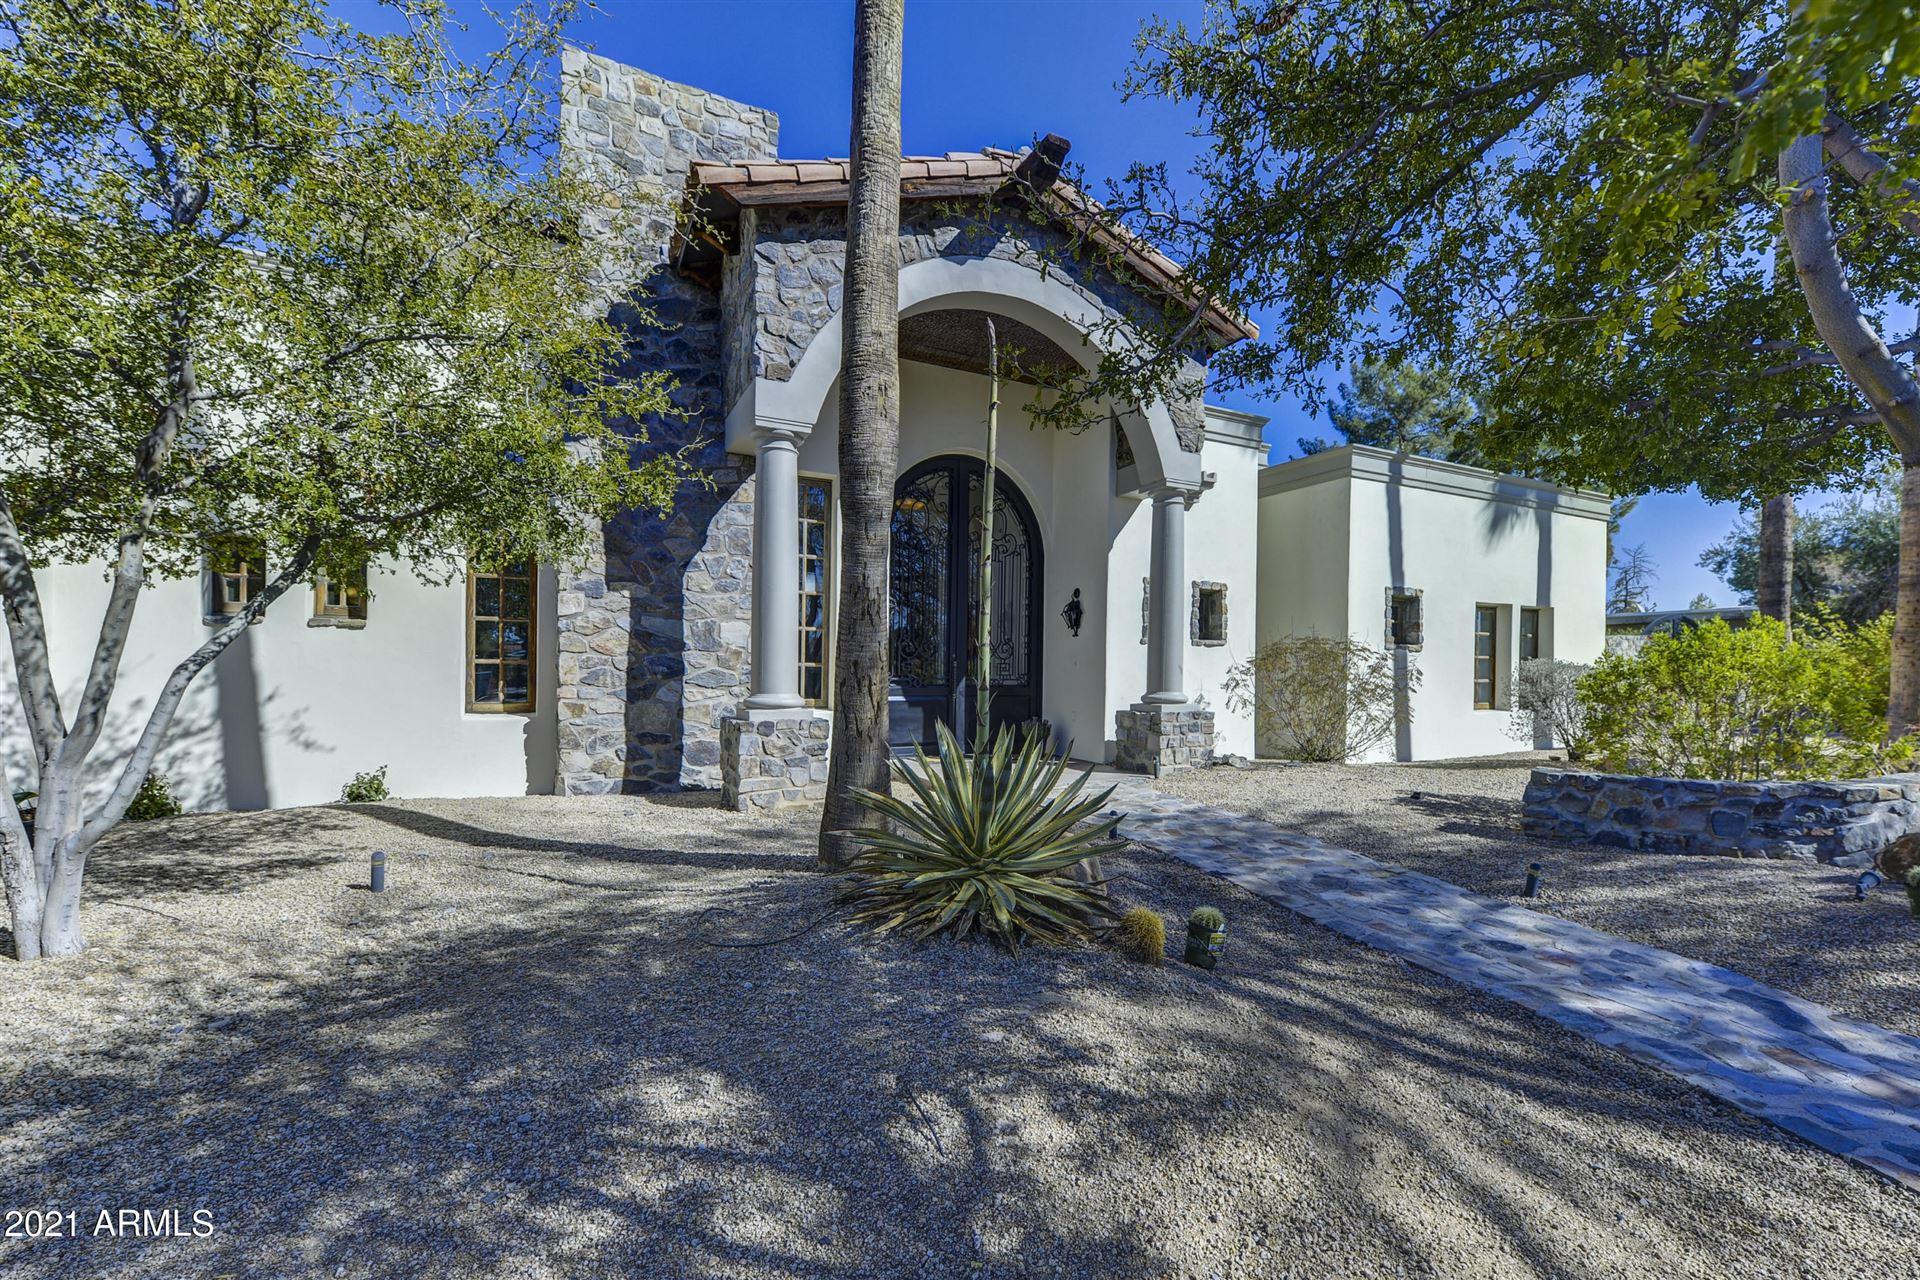 5402 E CORTEZ Drive, Scottsdale, AZ 85254 - #: 6194142